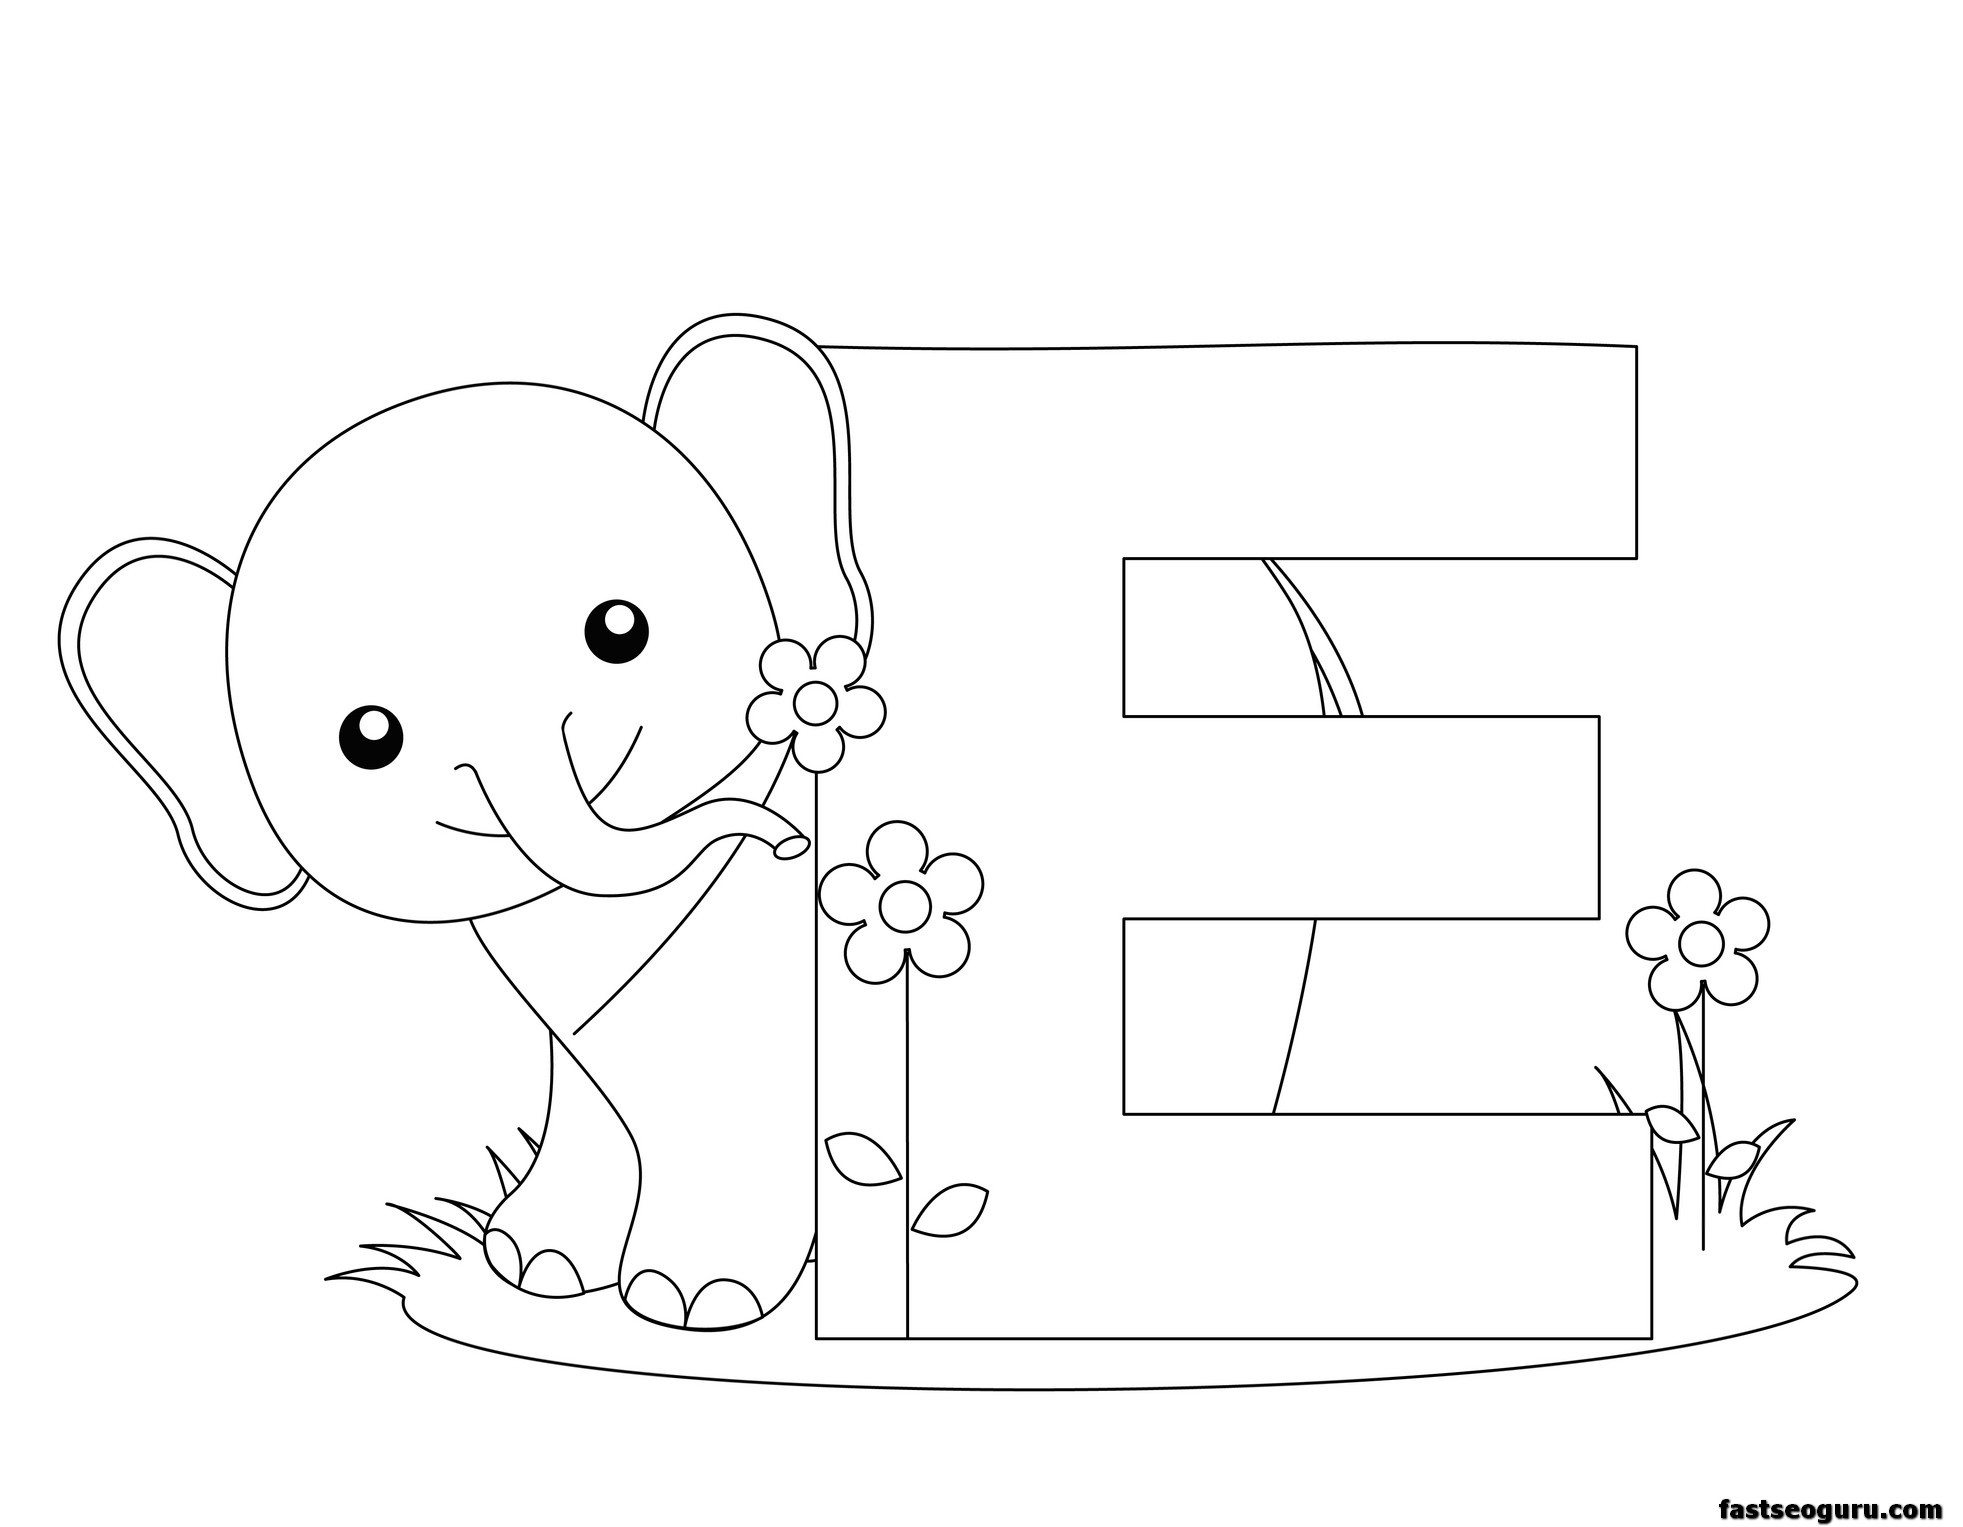 Printable Animal Alphabet Letter E For Elephant